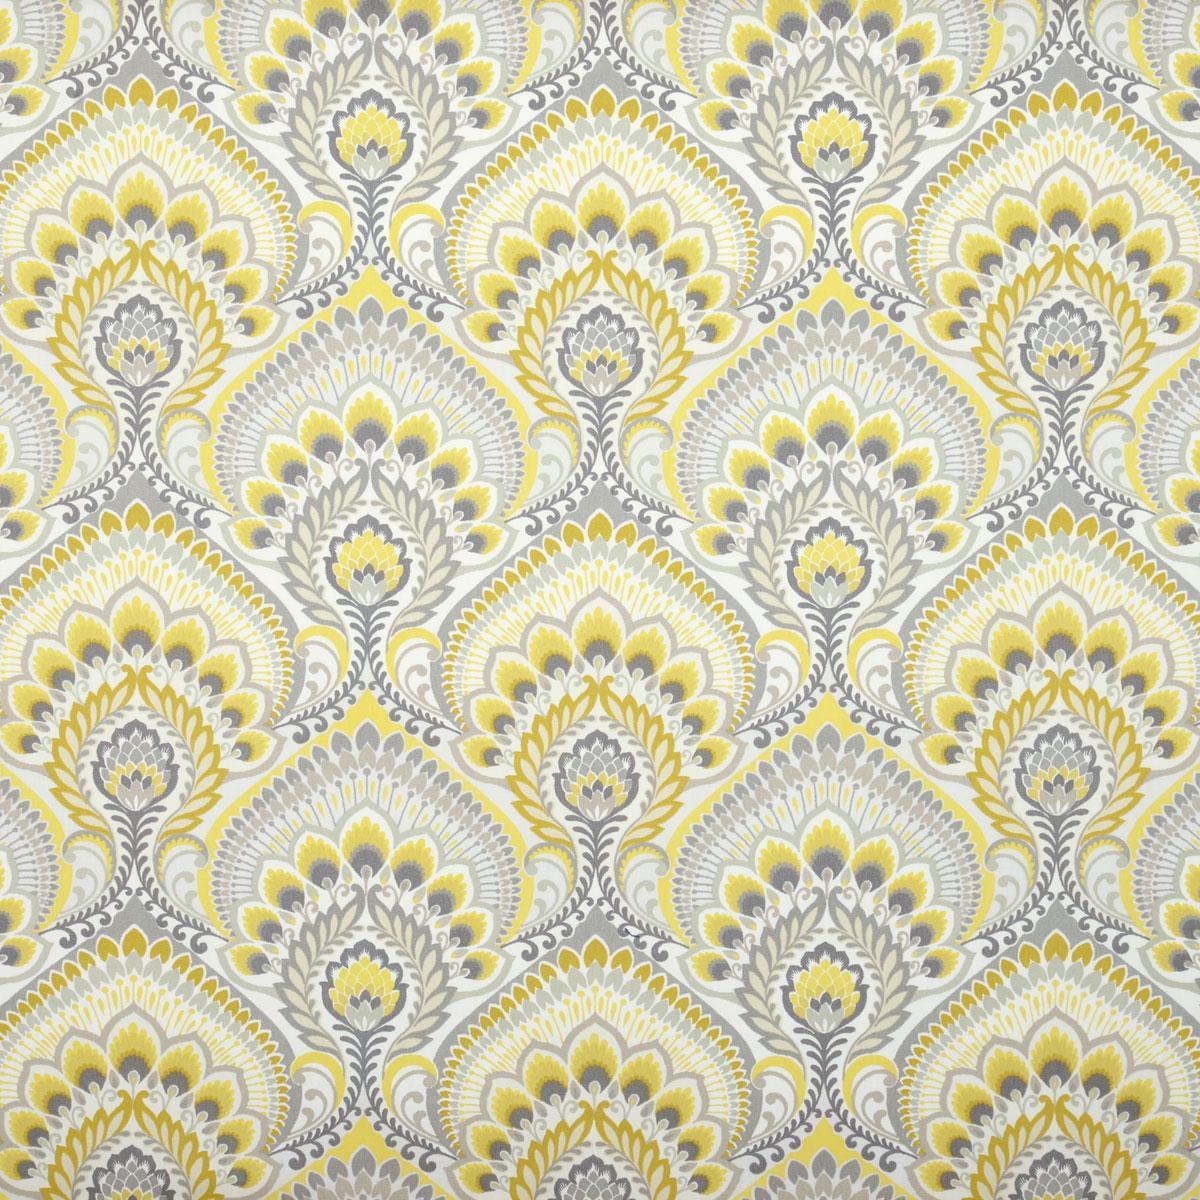 Nikita Curtain Fabric In Sulphur | Free UK Delivery | Terrys Fabrics